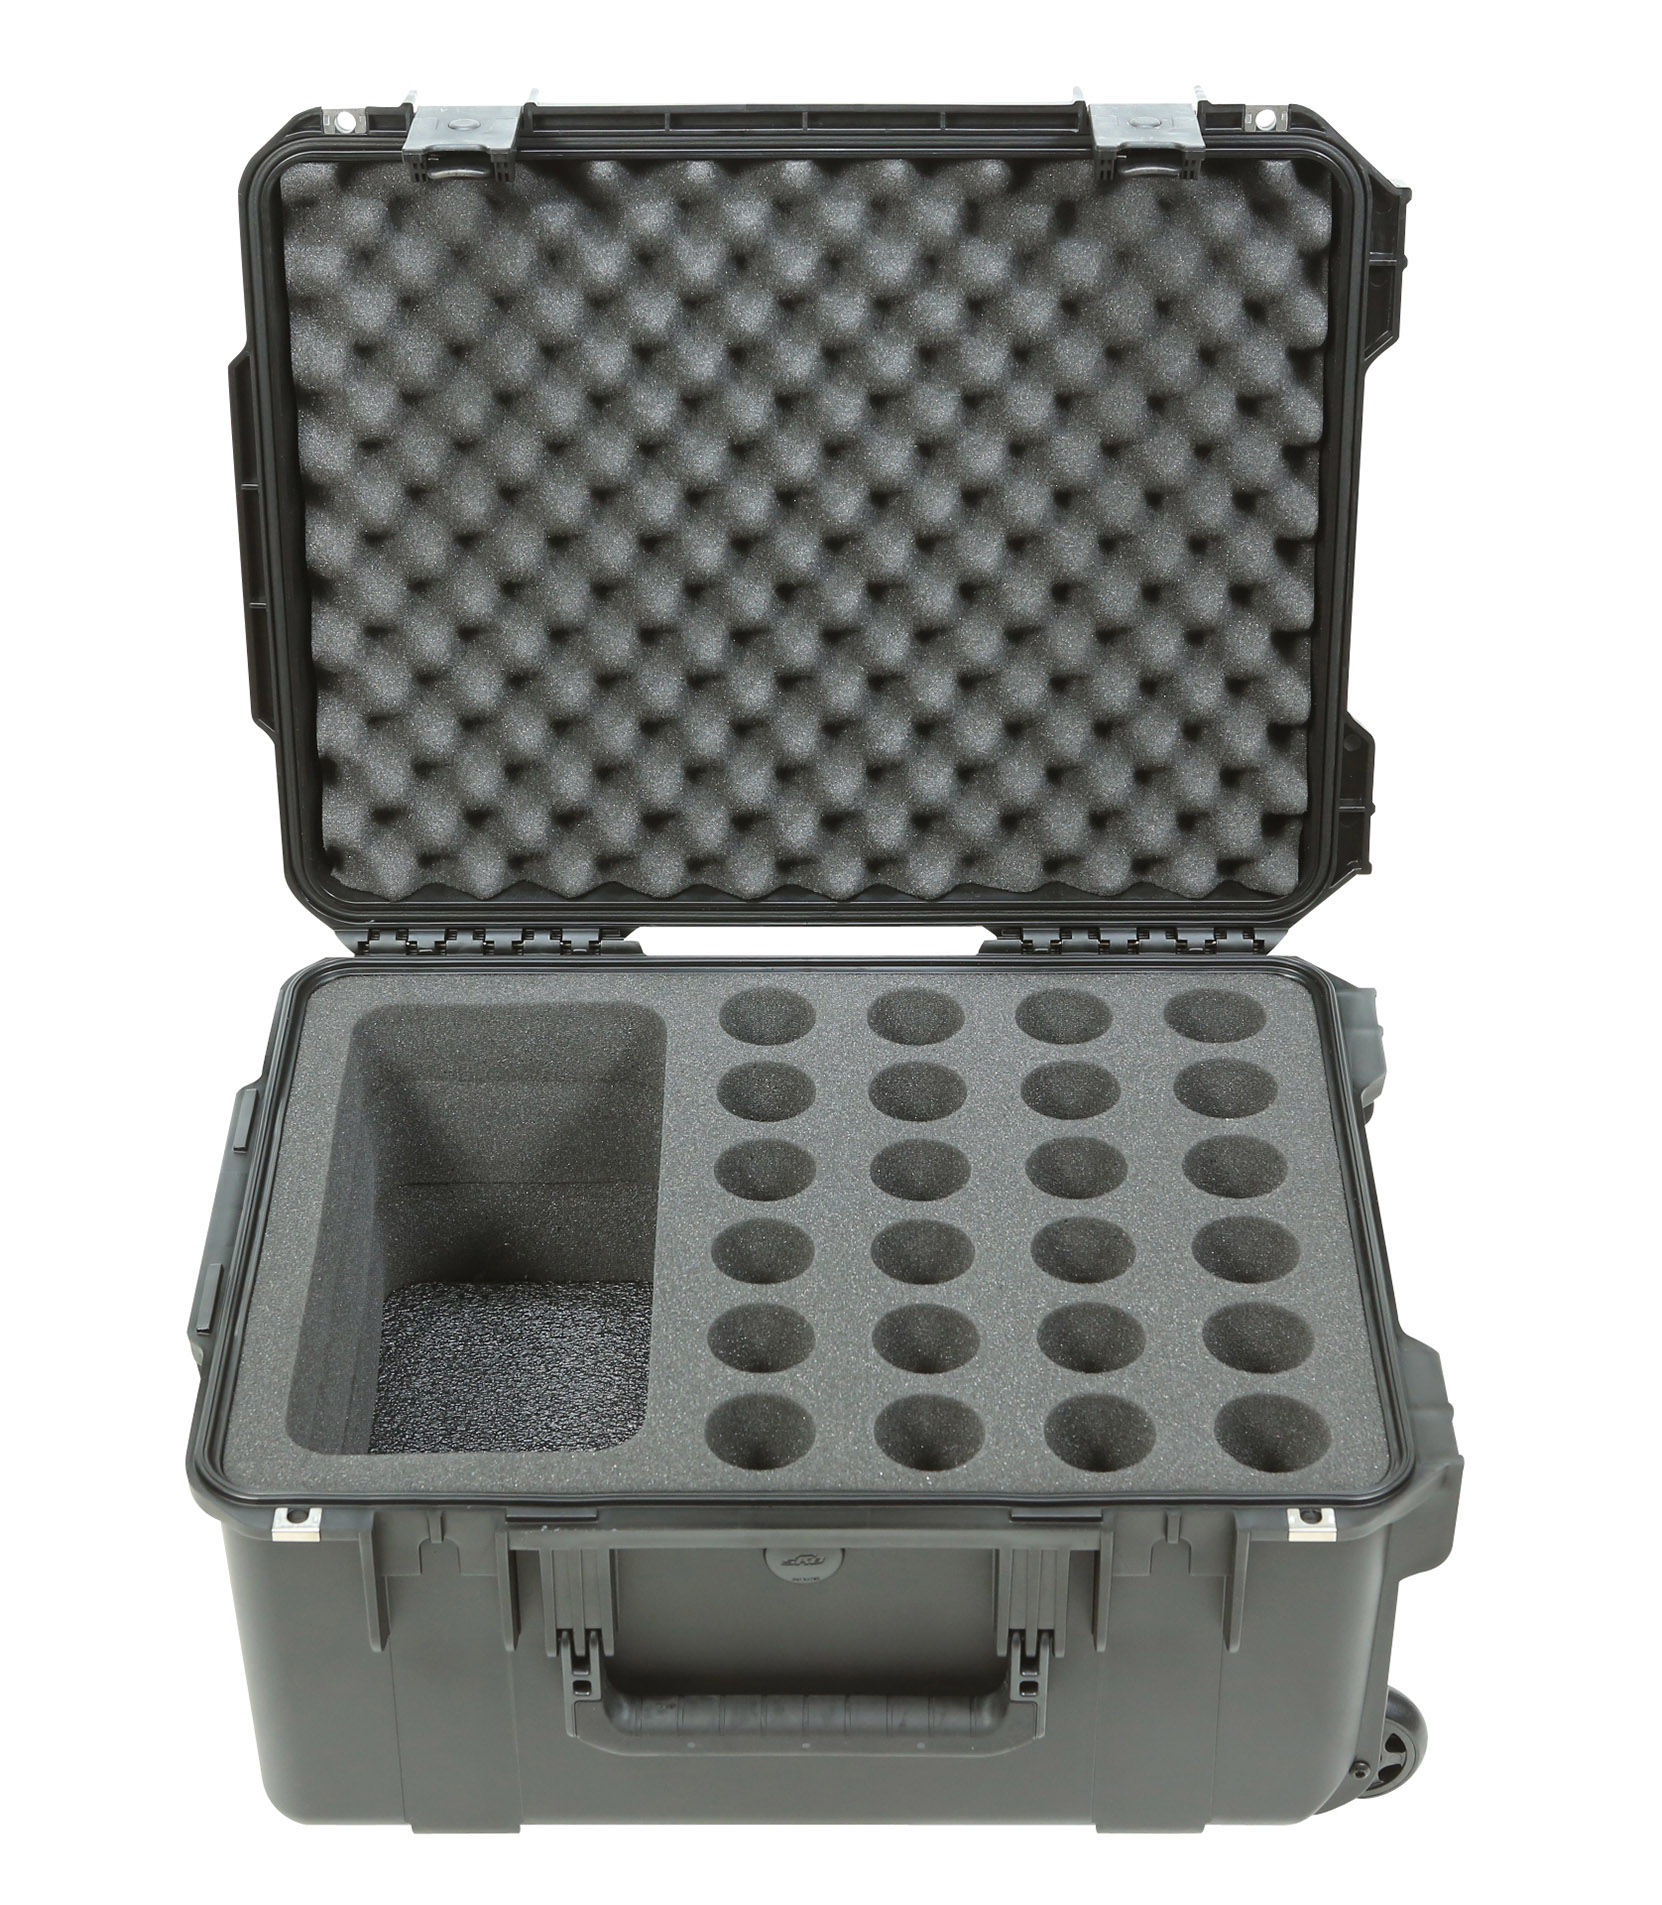 Buy SKB - 3I 2015 MC24 Injection Molded Case w Foam for 24